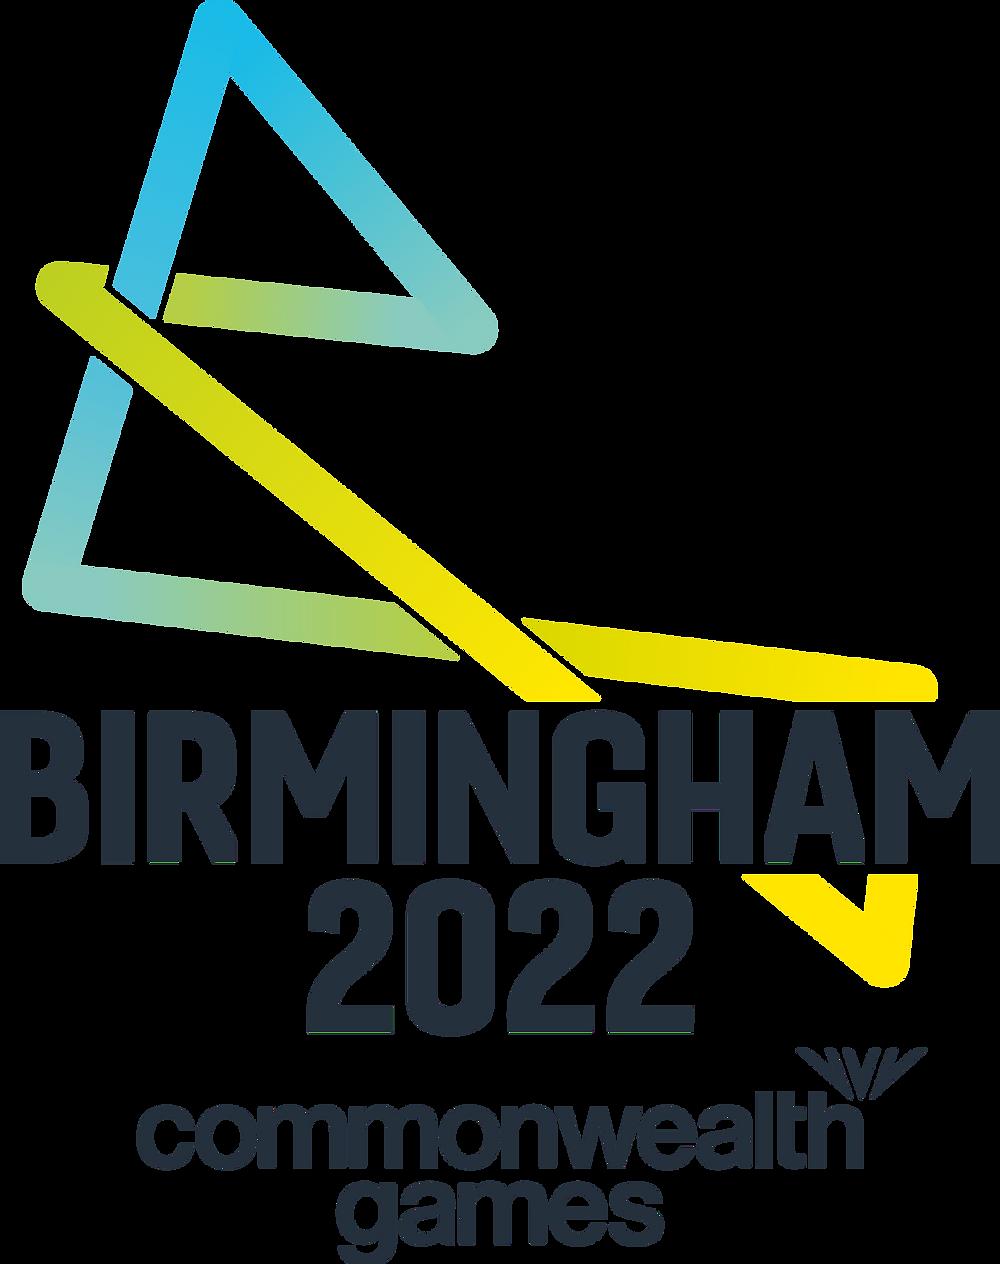 Official Birmingham 2022 Commonwealth Games logo